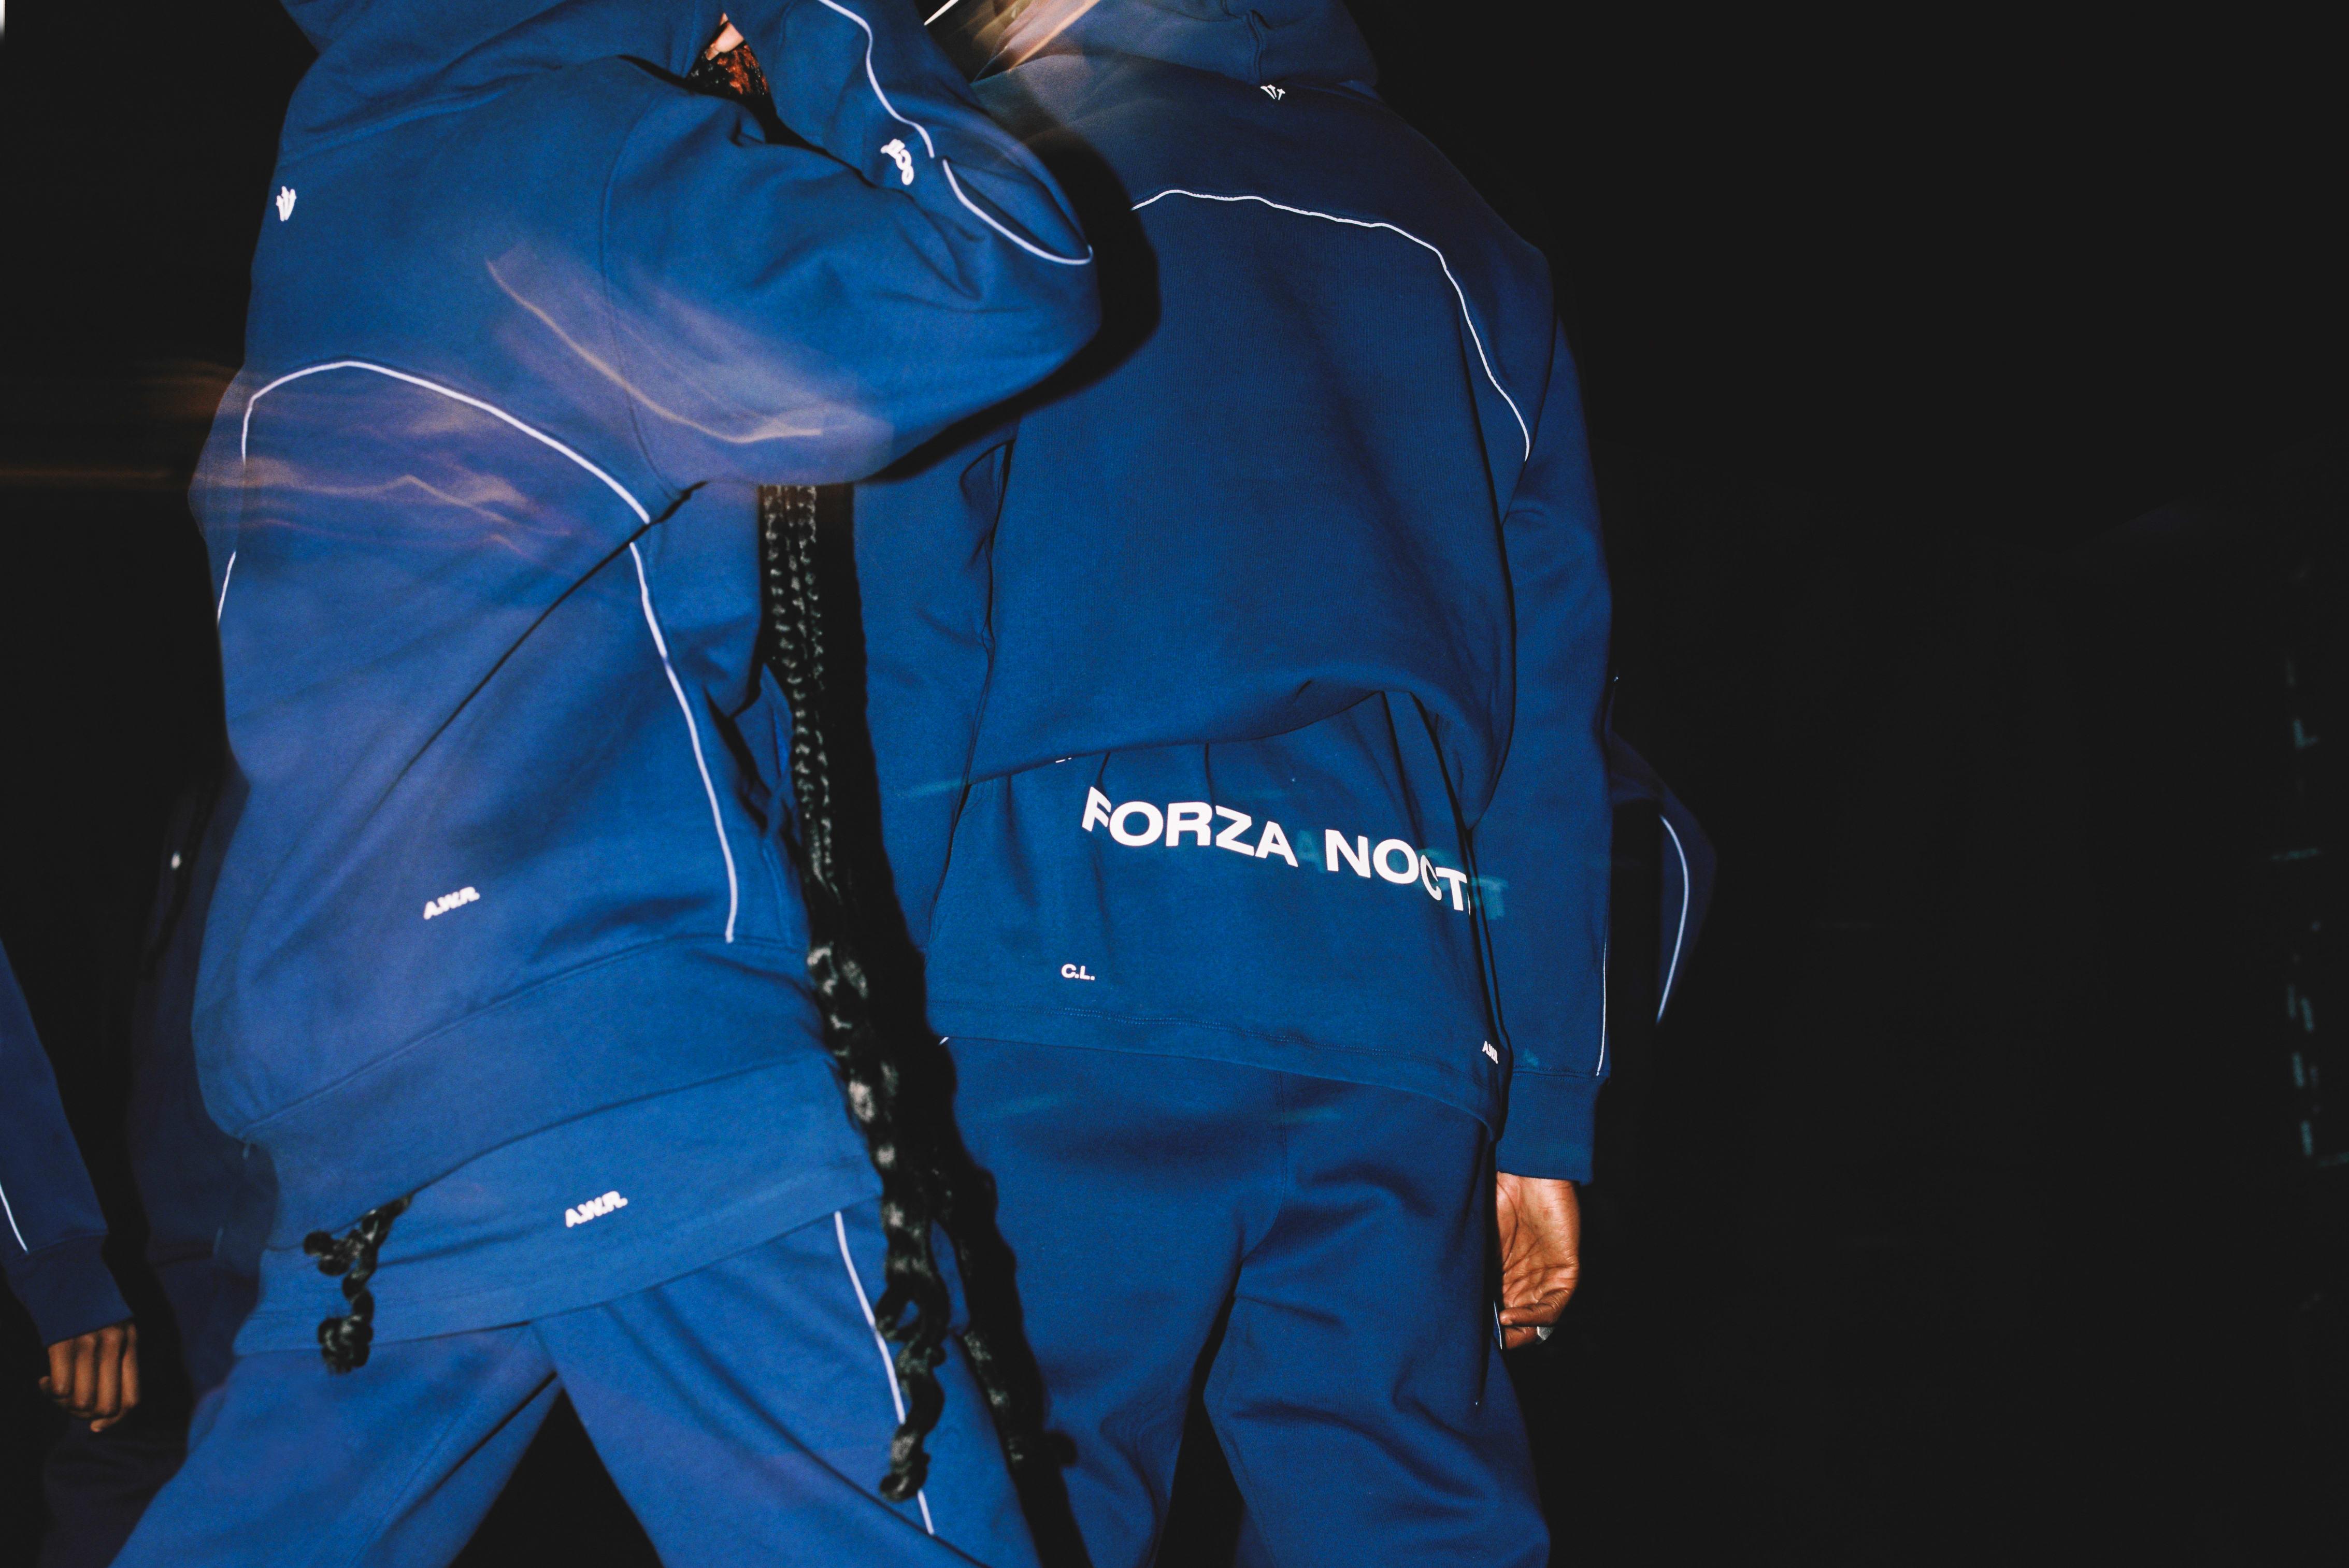 Nike Nocta SS21